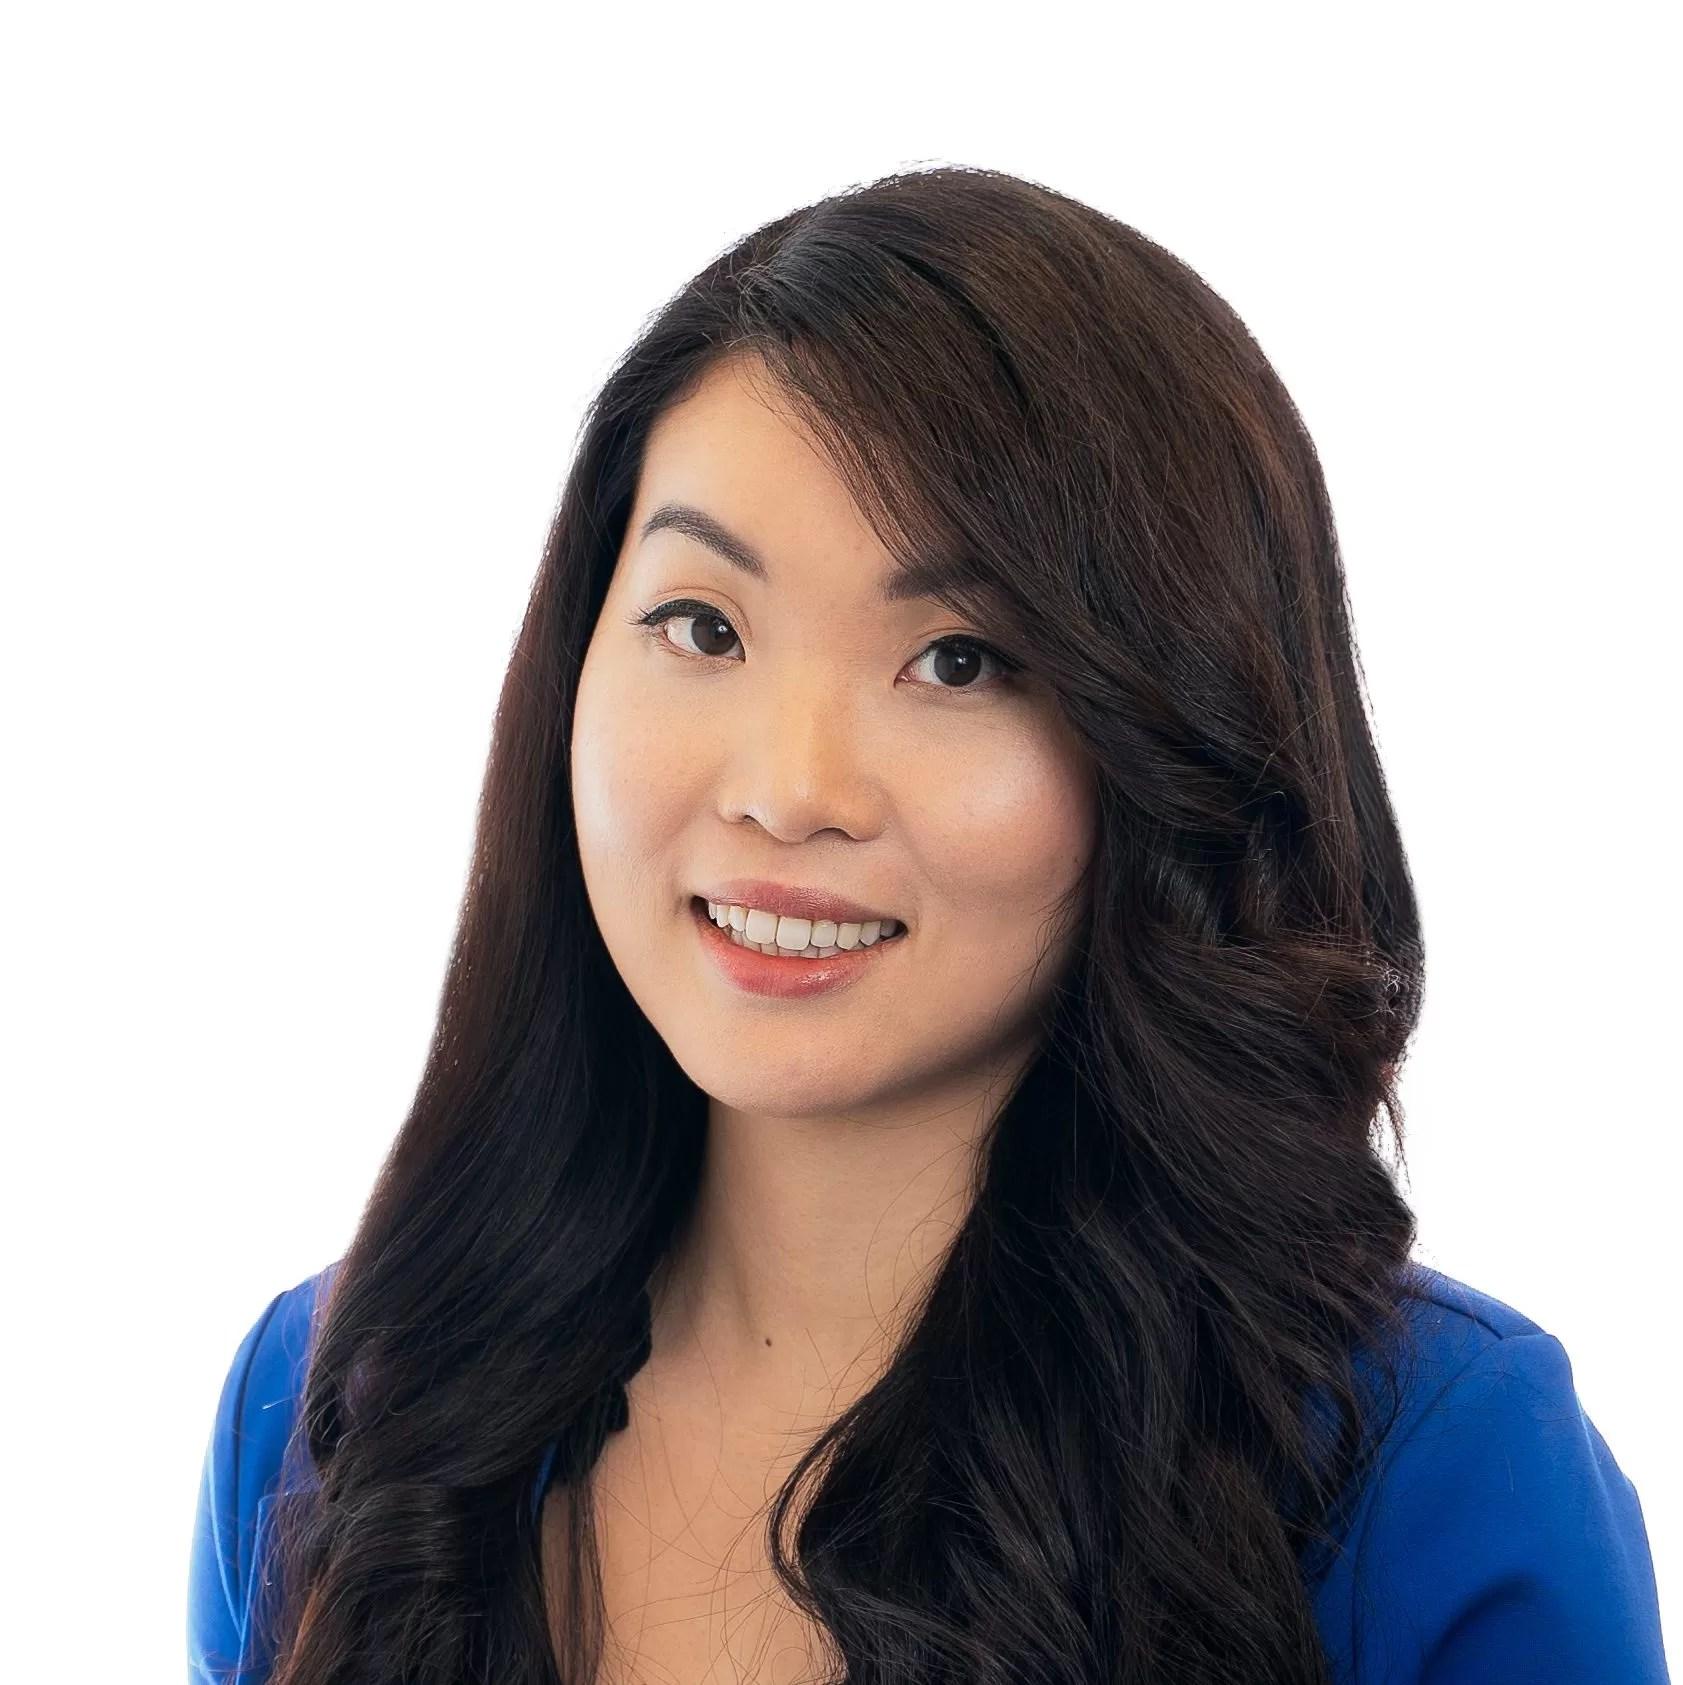 Anita Lee Catch Communications Digital Marketing Agency Owner